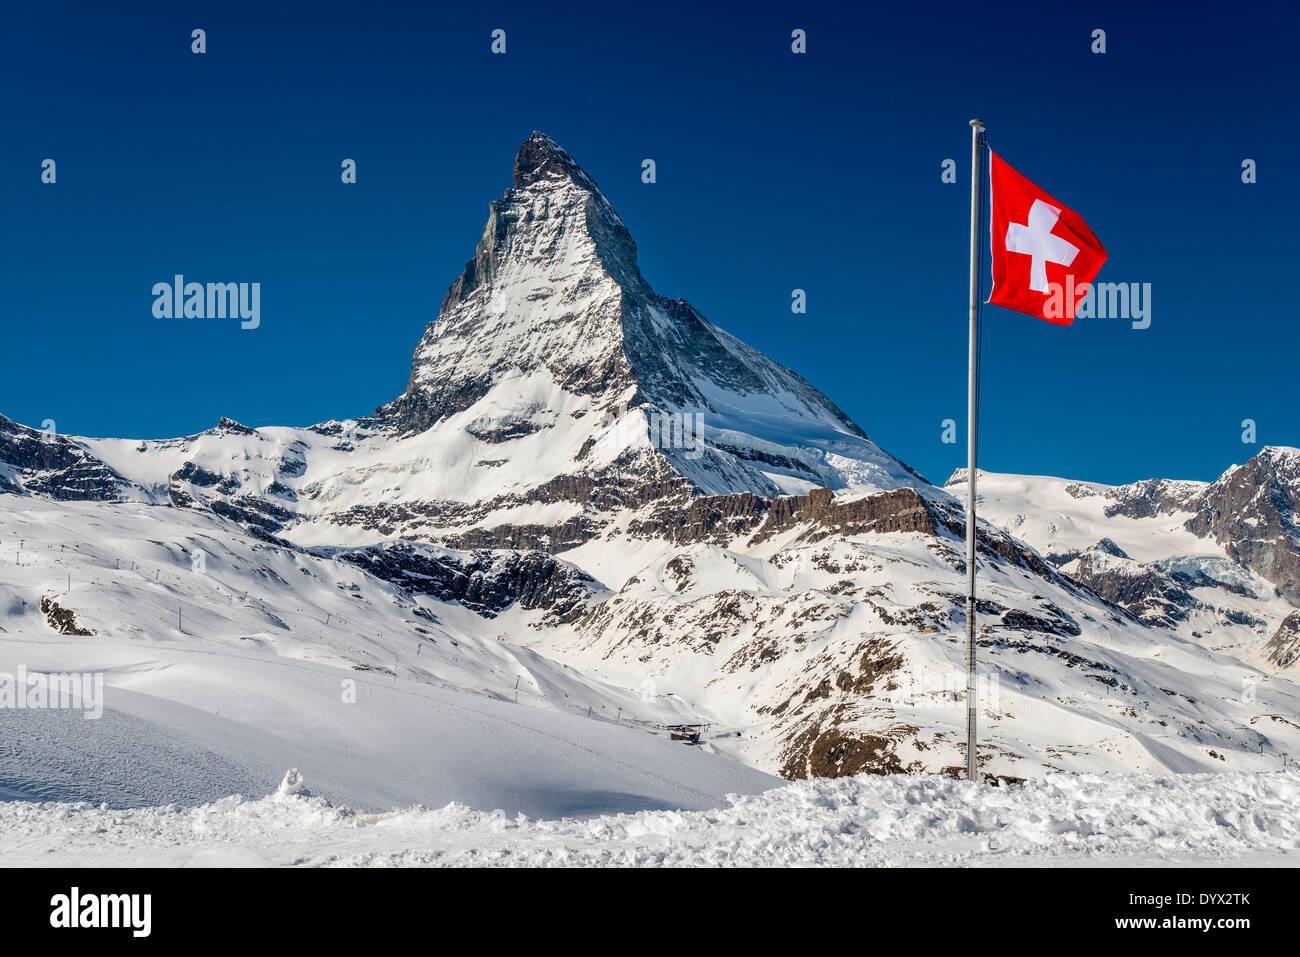 Winter view of Matterhorn with Swiss flag, Zermatt, Wallis or Valais, Switzerland - Stock Image